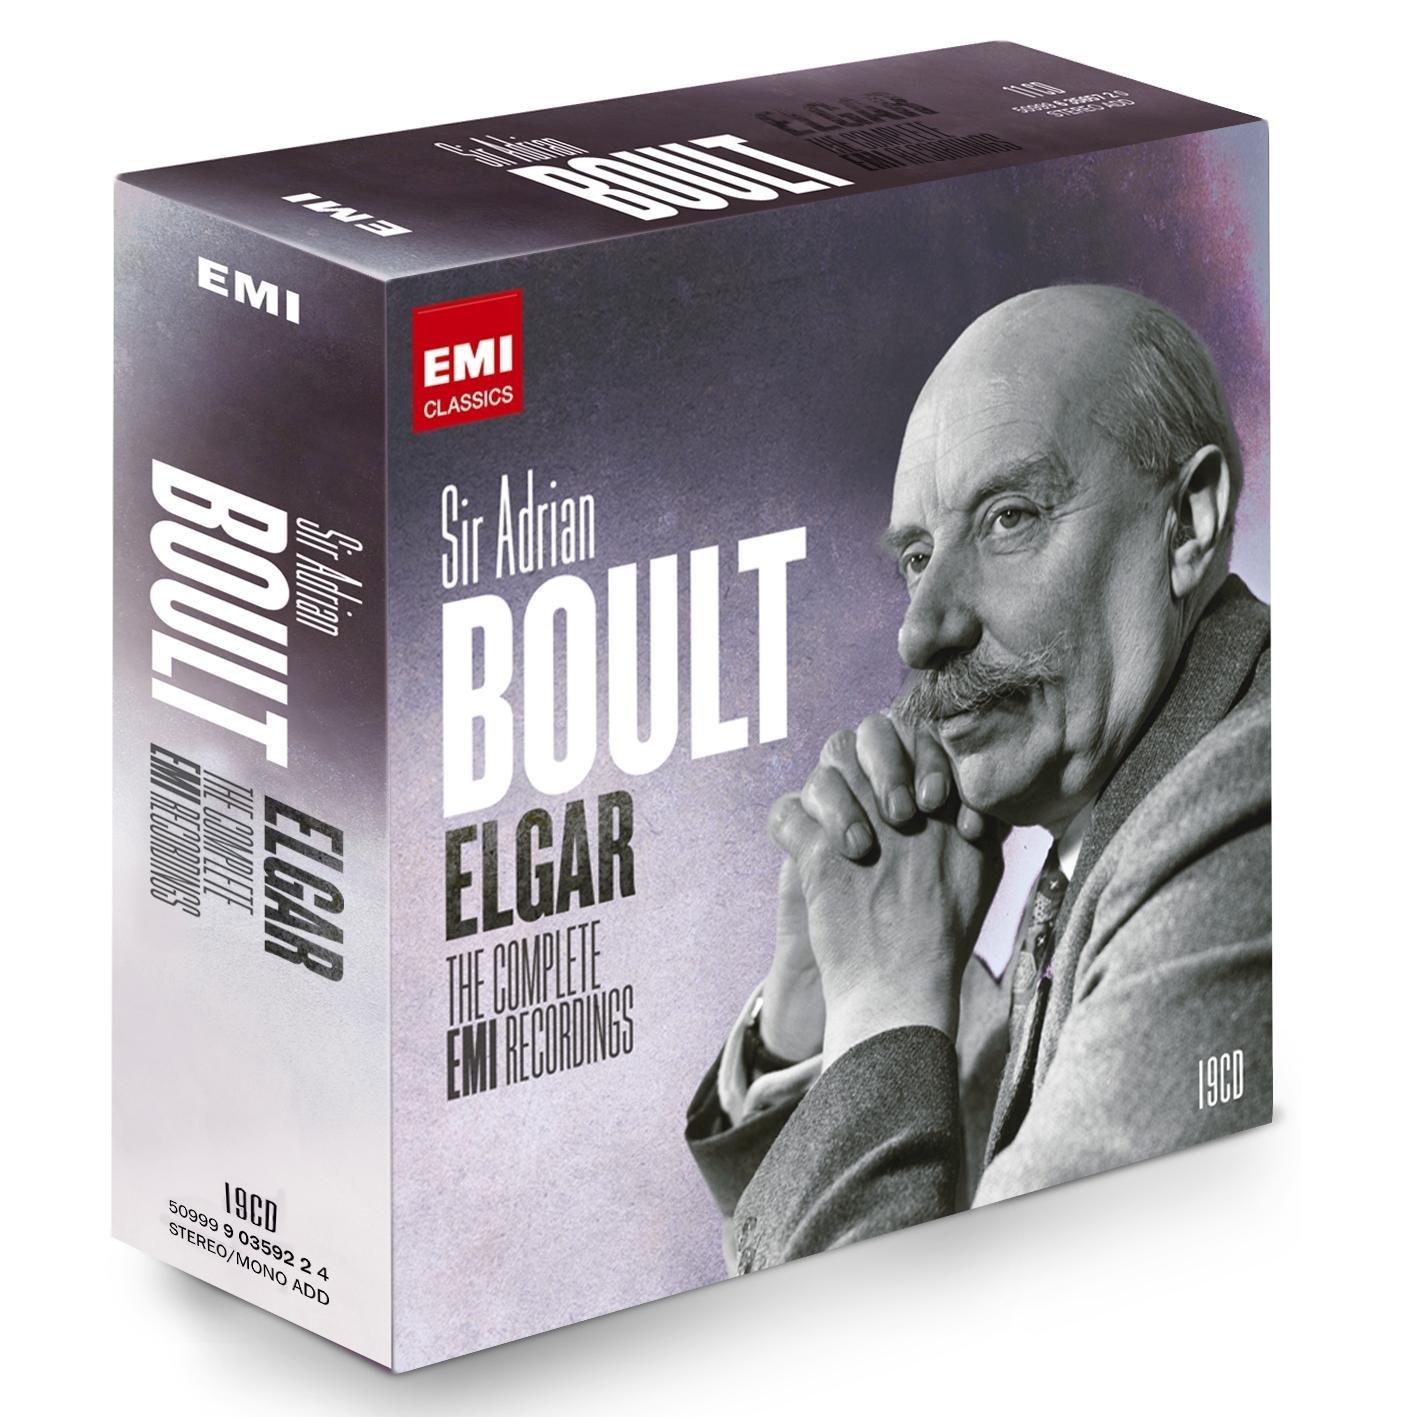 EMI Sir Adrian Boult  Elgar's Complete Recordings